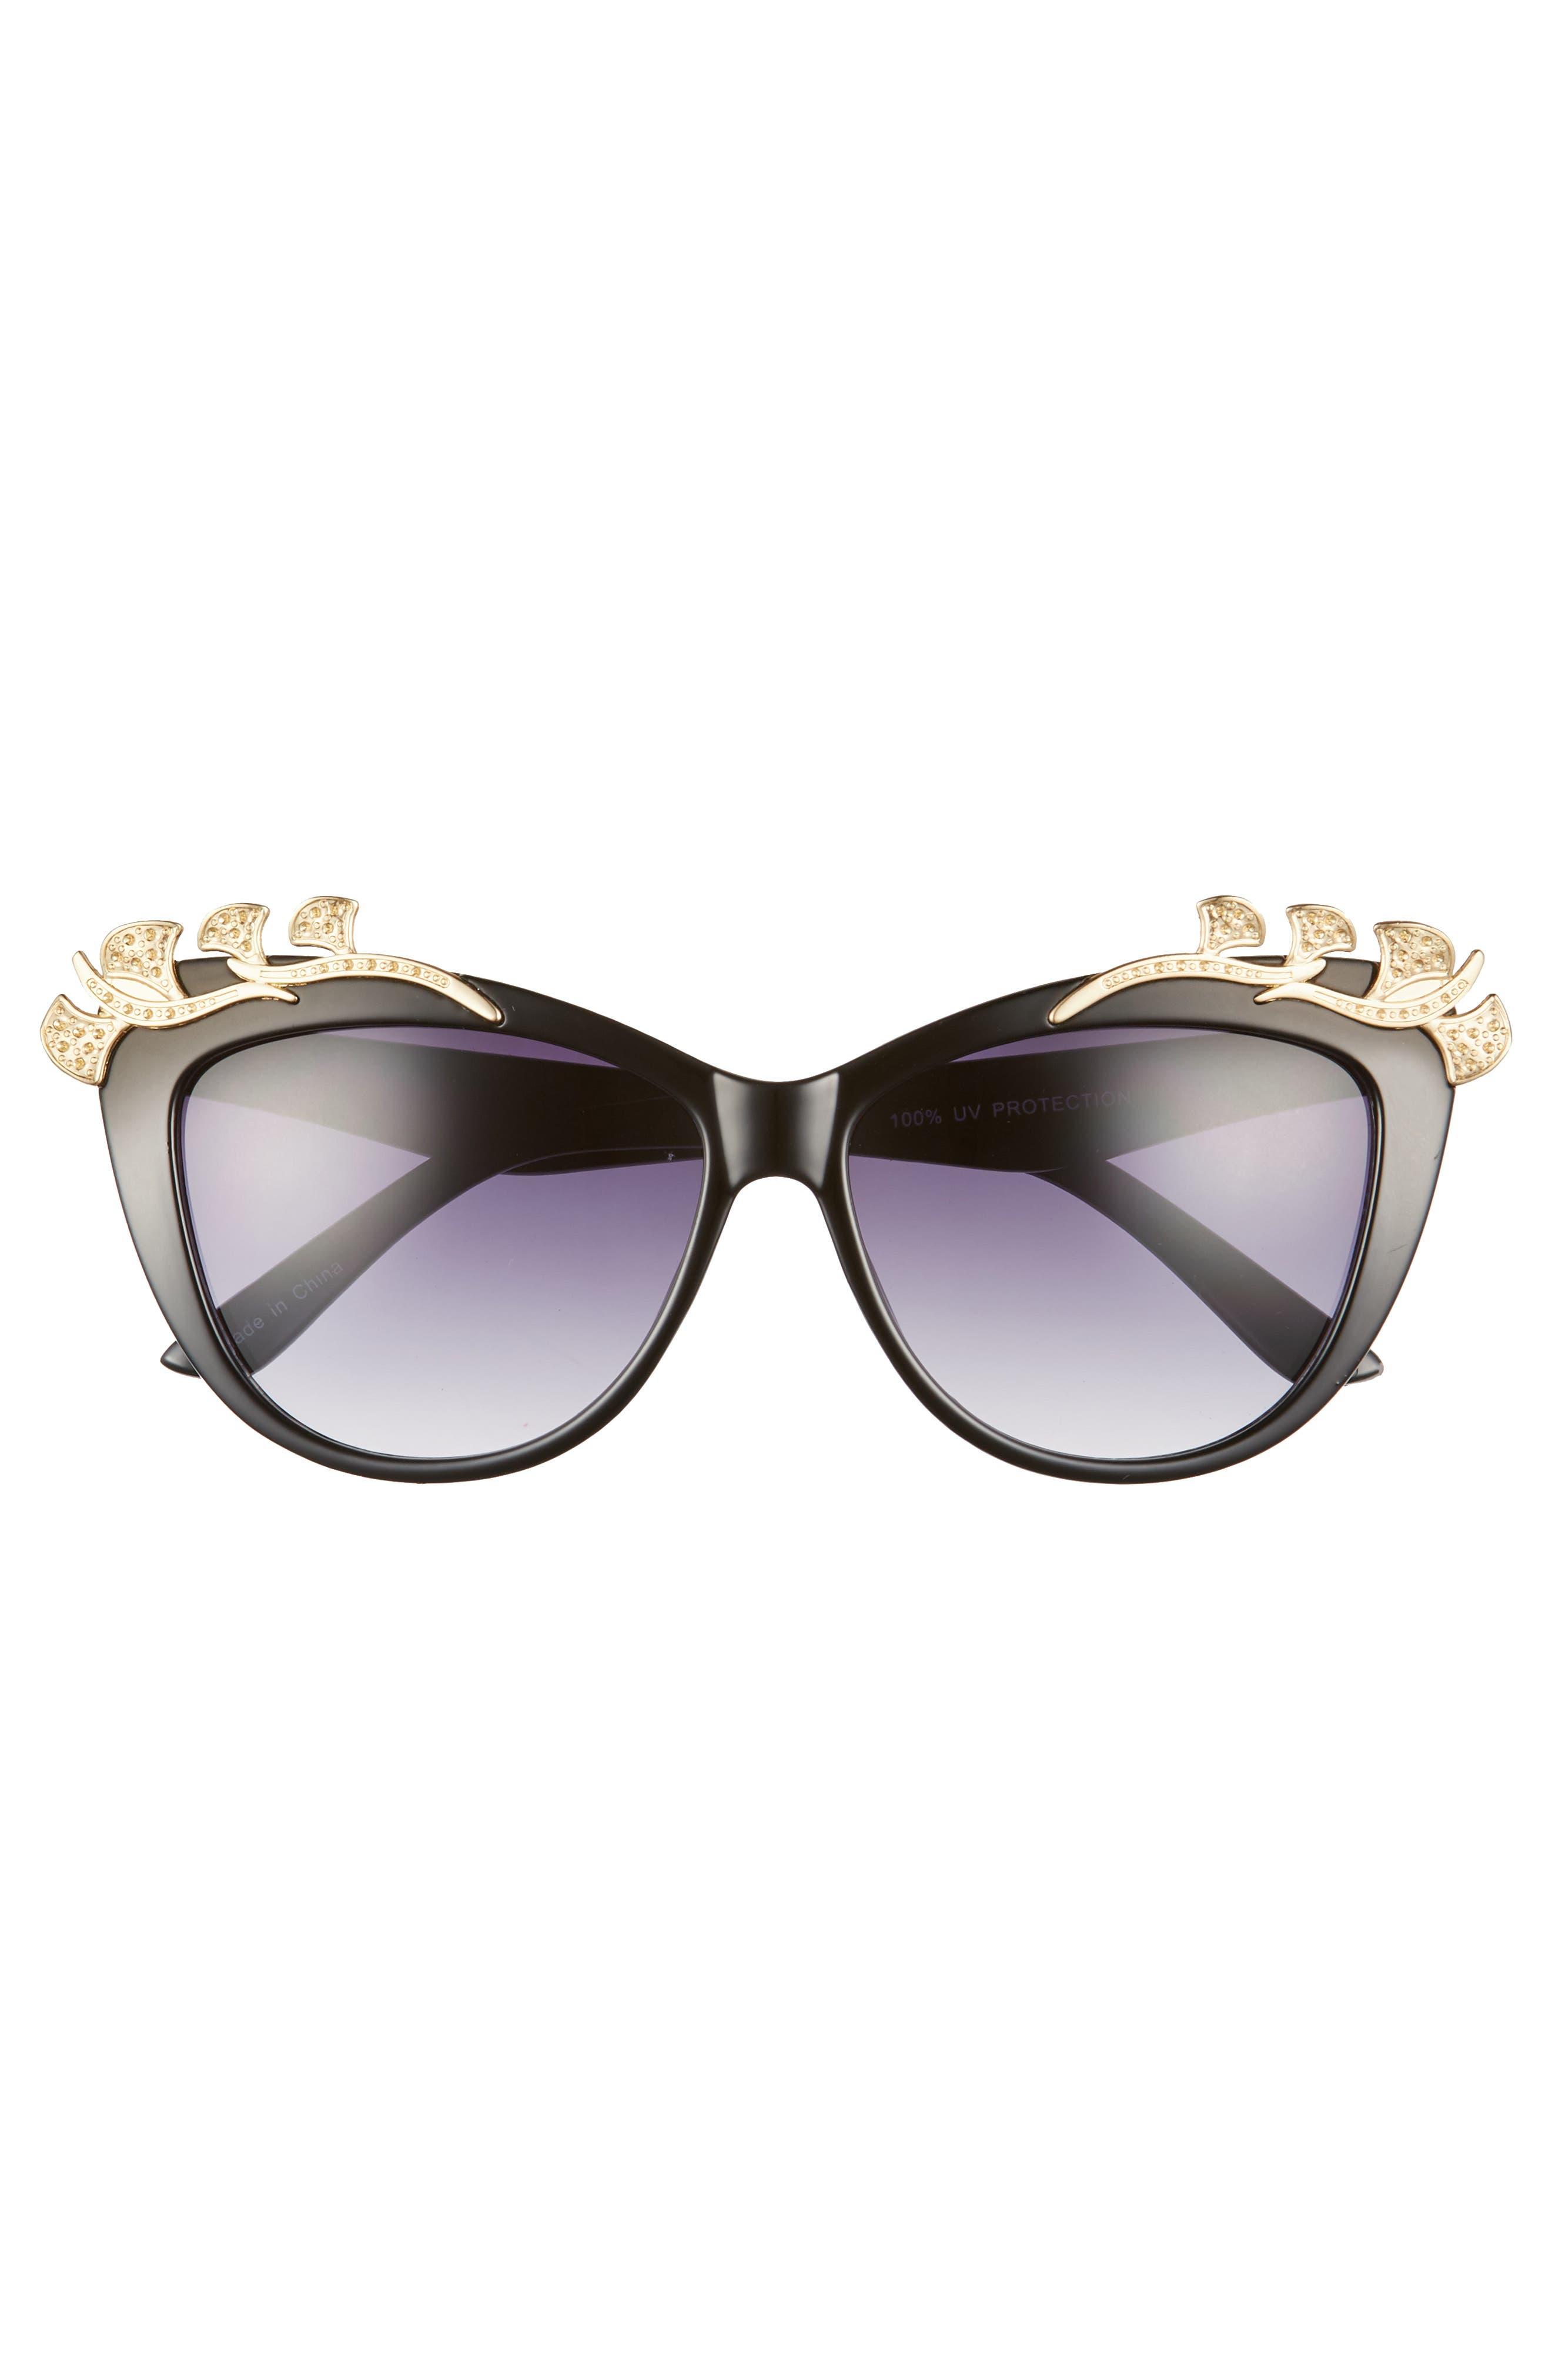 57mm Embellished Sunglasses,                             Alternate thumbnail 3, color,                             001